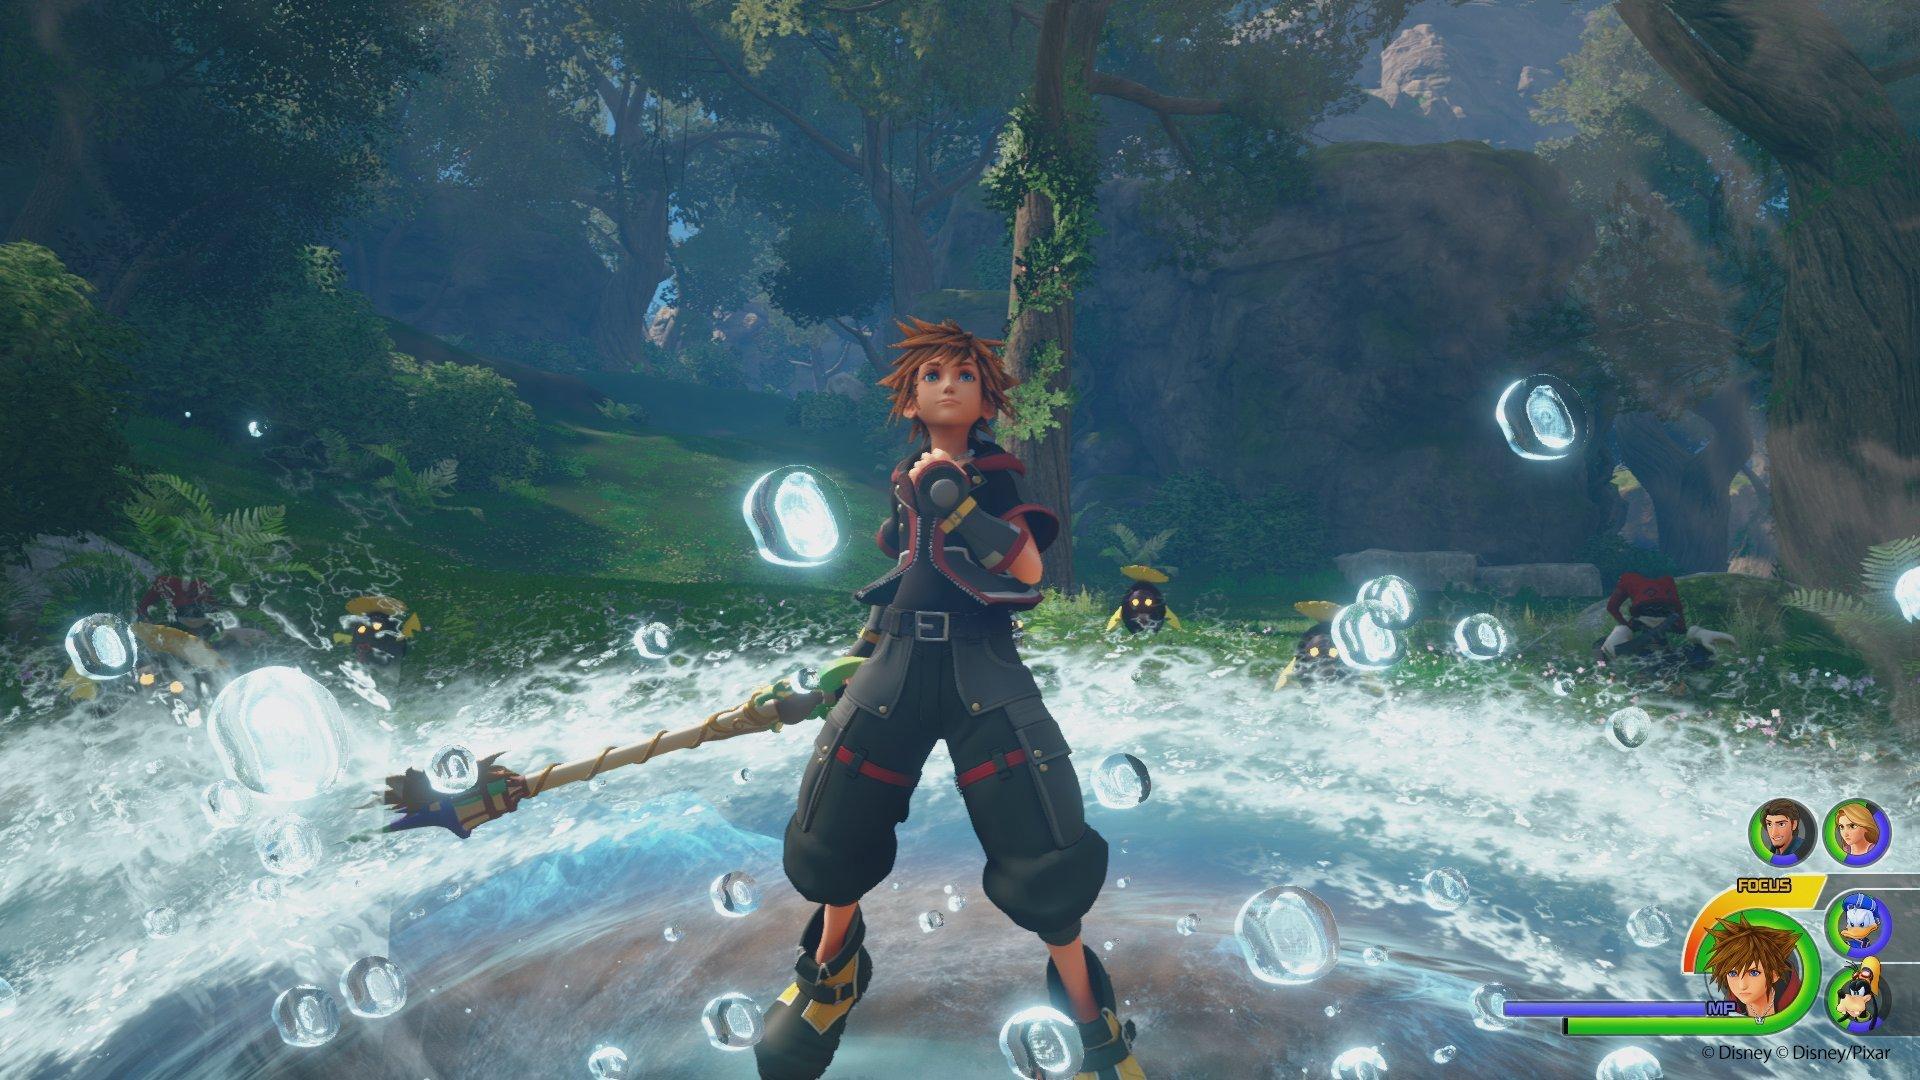 Kingdom Hearts III - Xbox One by Square Enix (Image #20)